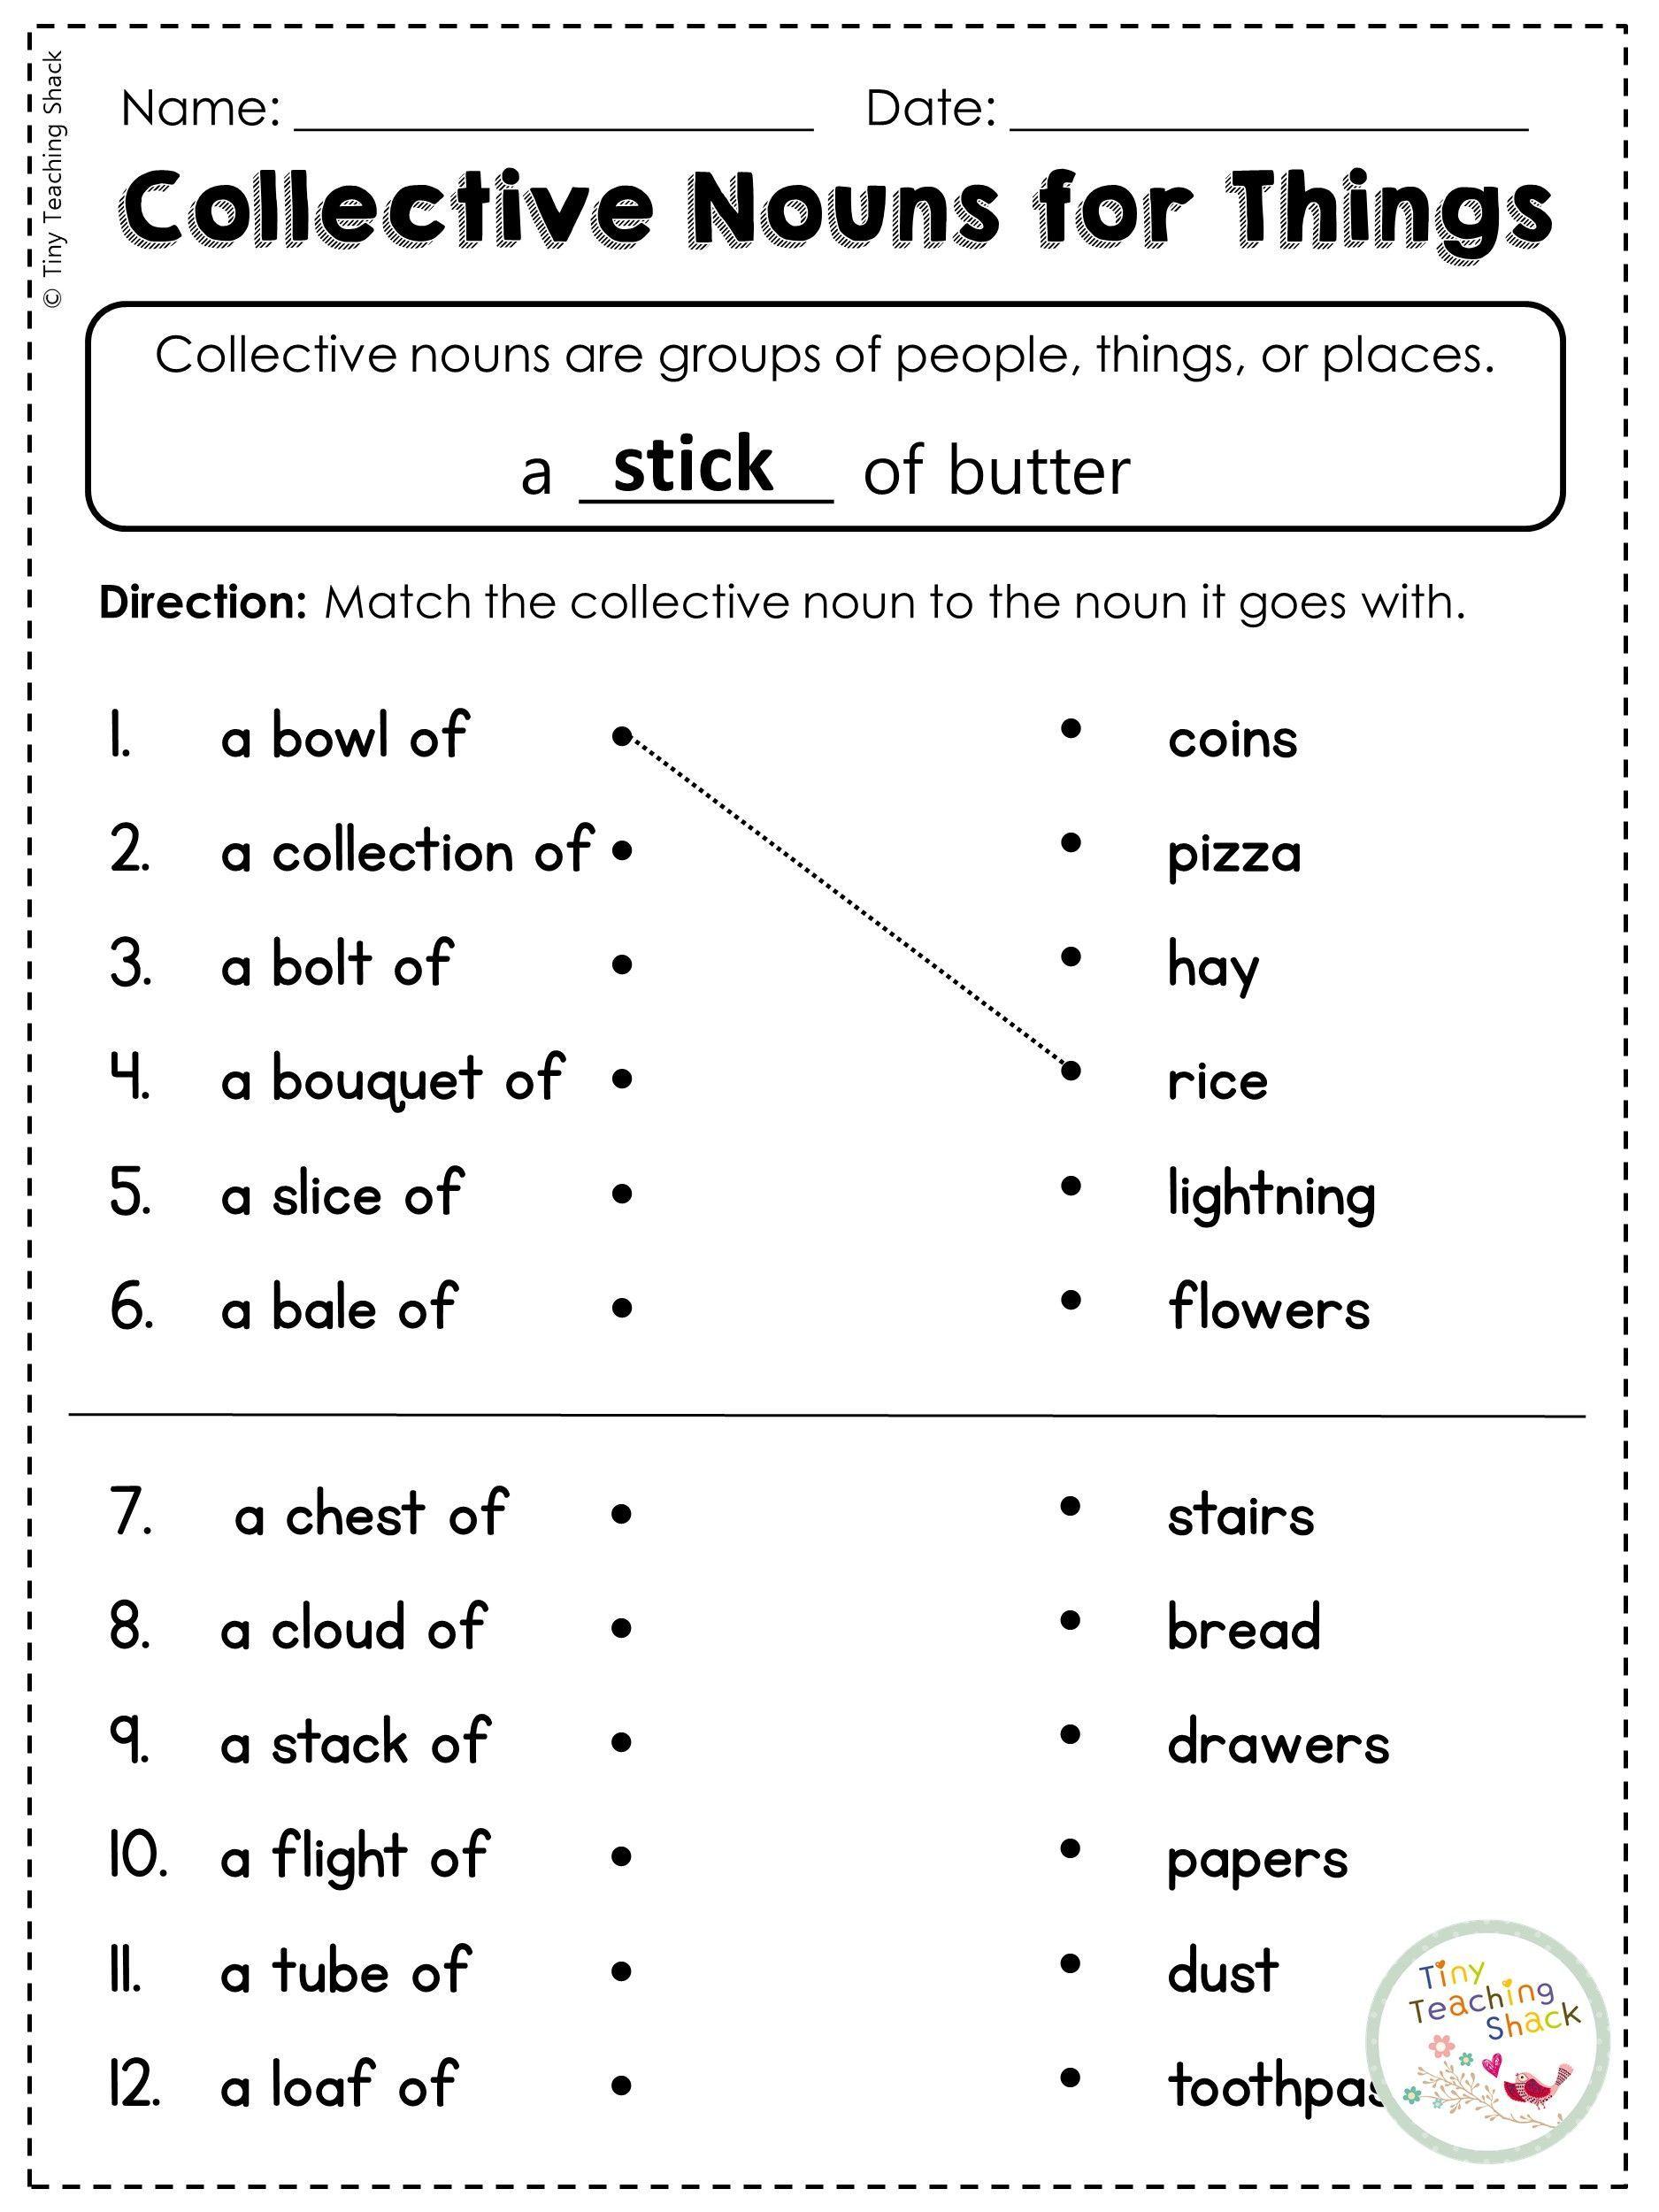 Collective Nouns Worksheet 10 Vocabulary Worksheets Collective Nouns Worksheet Nouns Worksheet Third Grade Grammar Worksheets